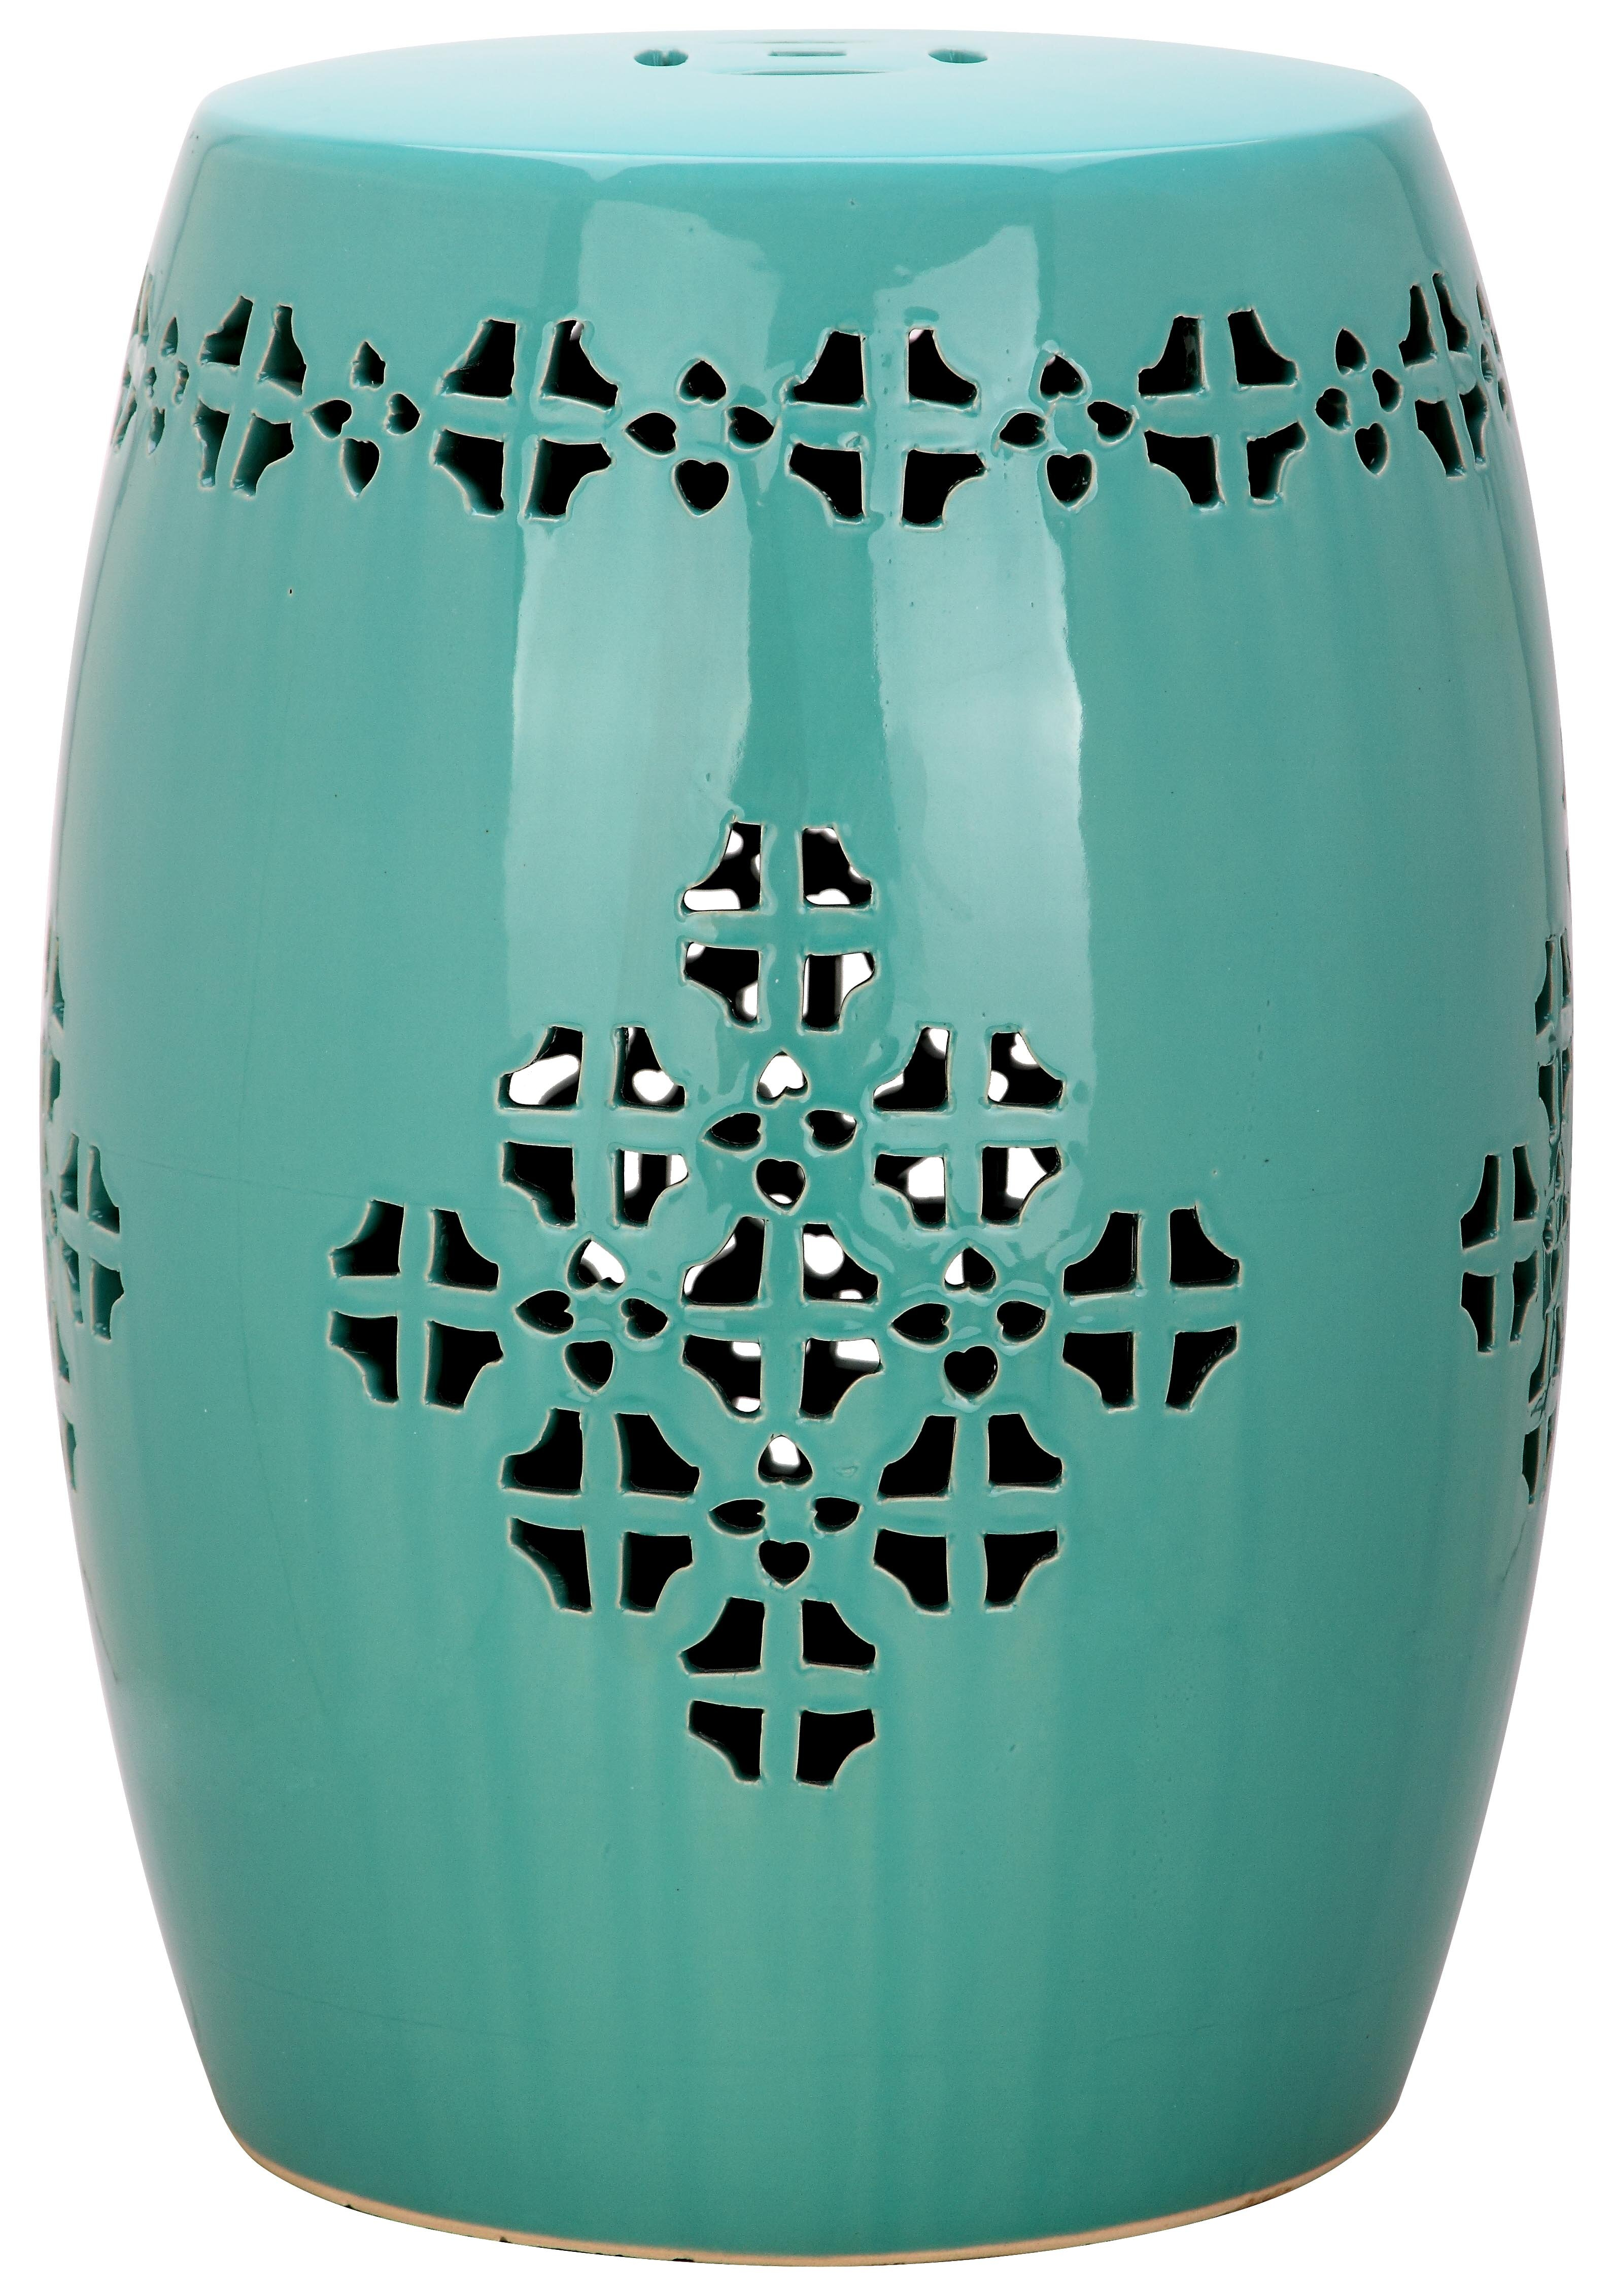 Lorelei Ceramic Garden Stool Reviews Allmodern